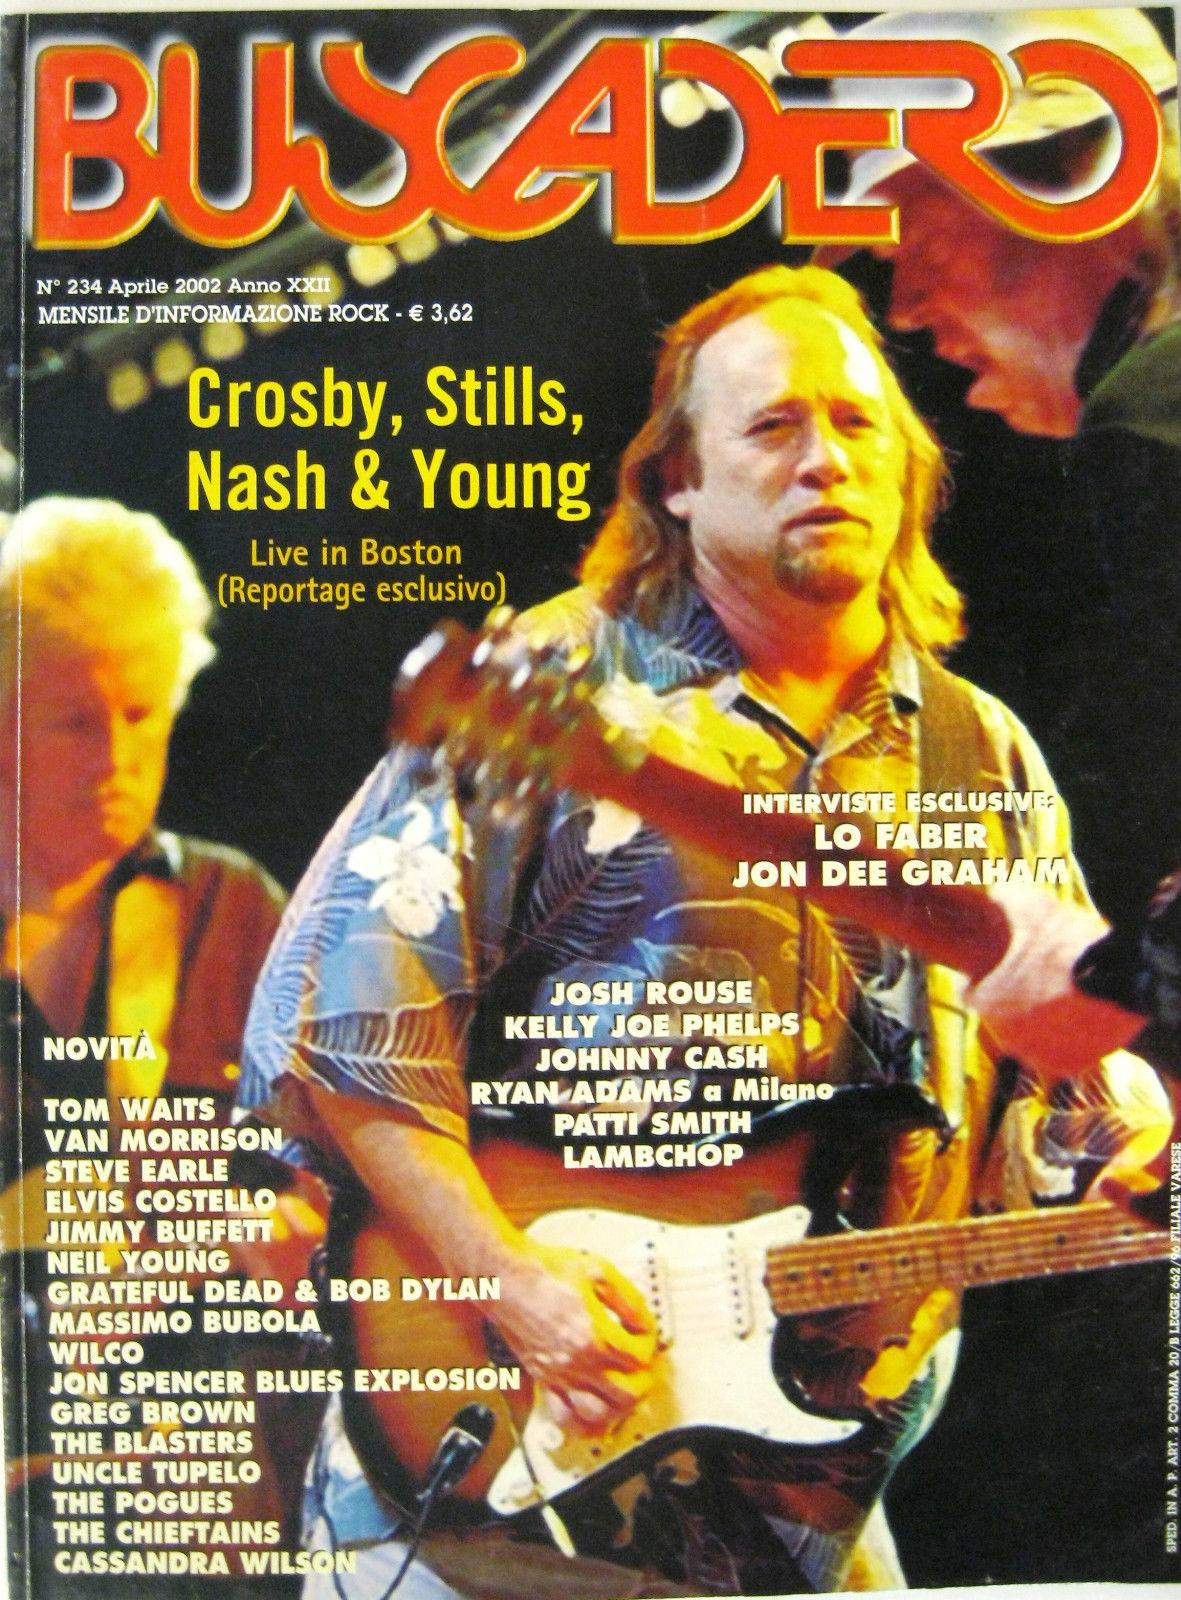 Buscadero n. 234 (aprile 2002)